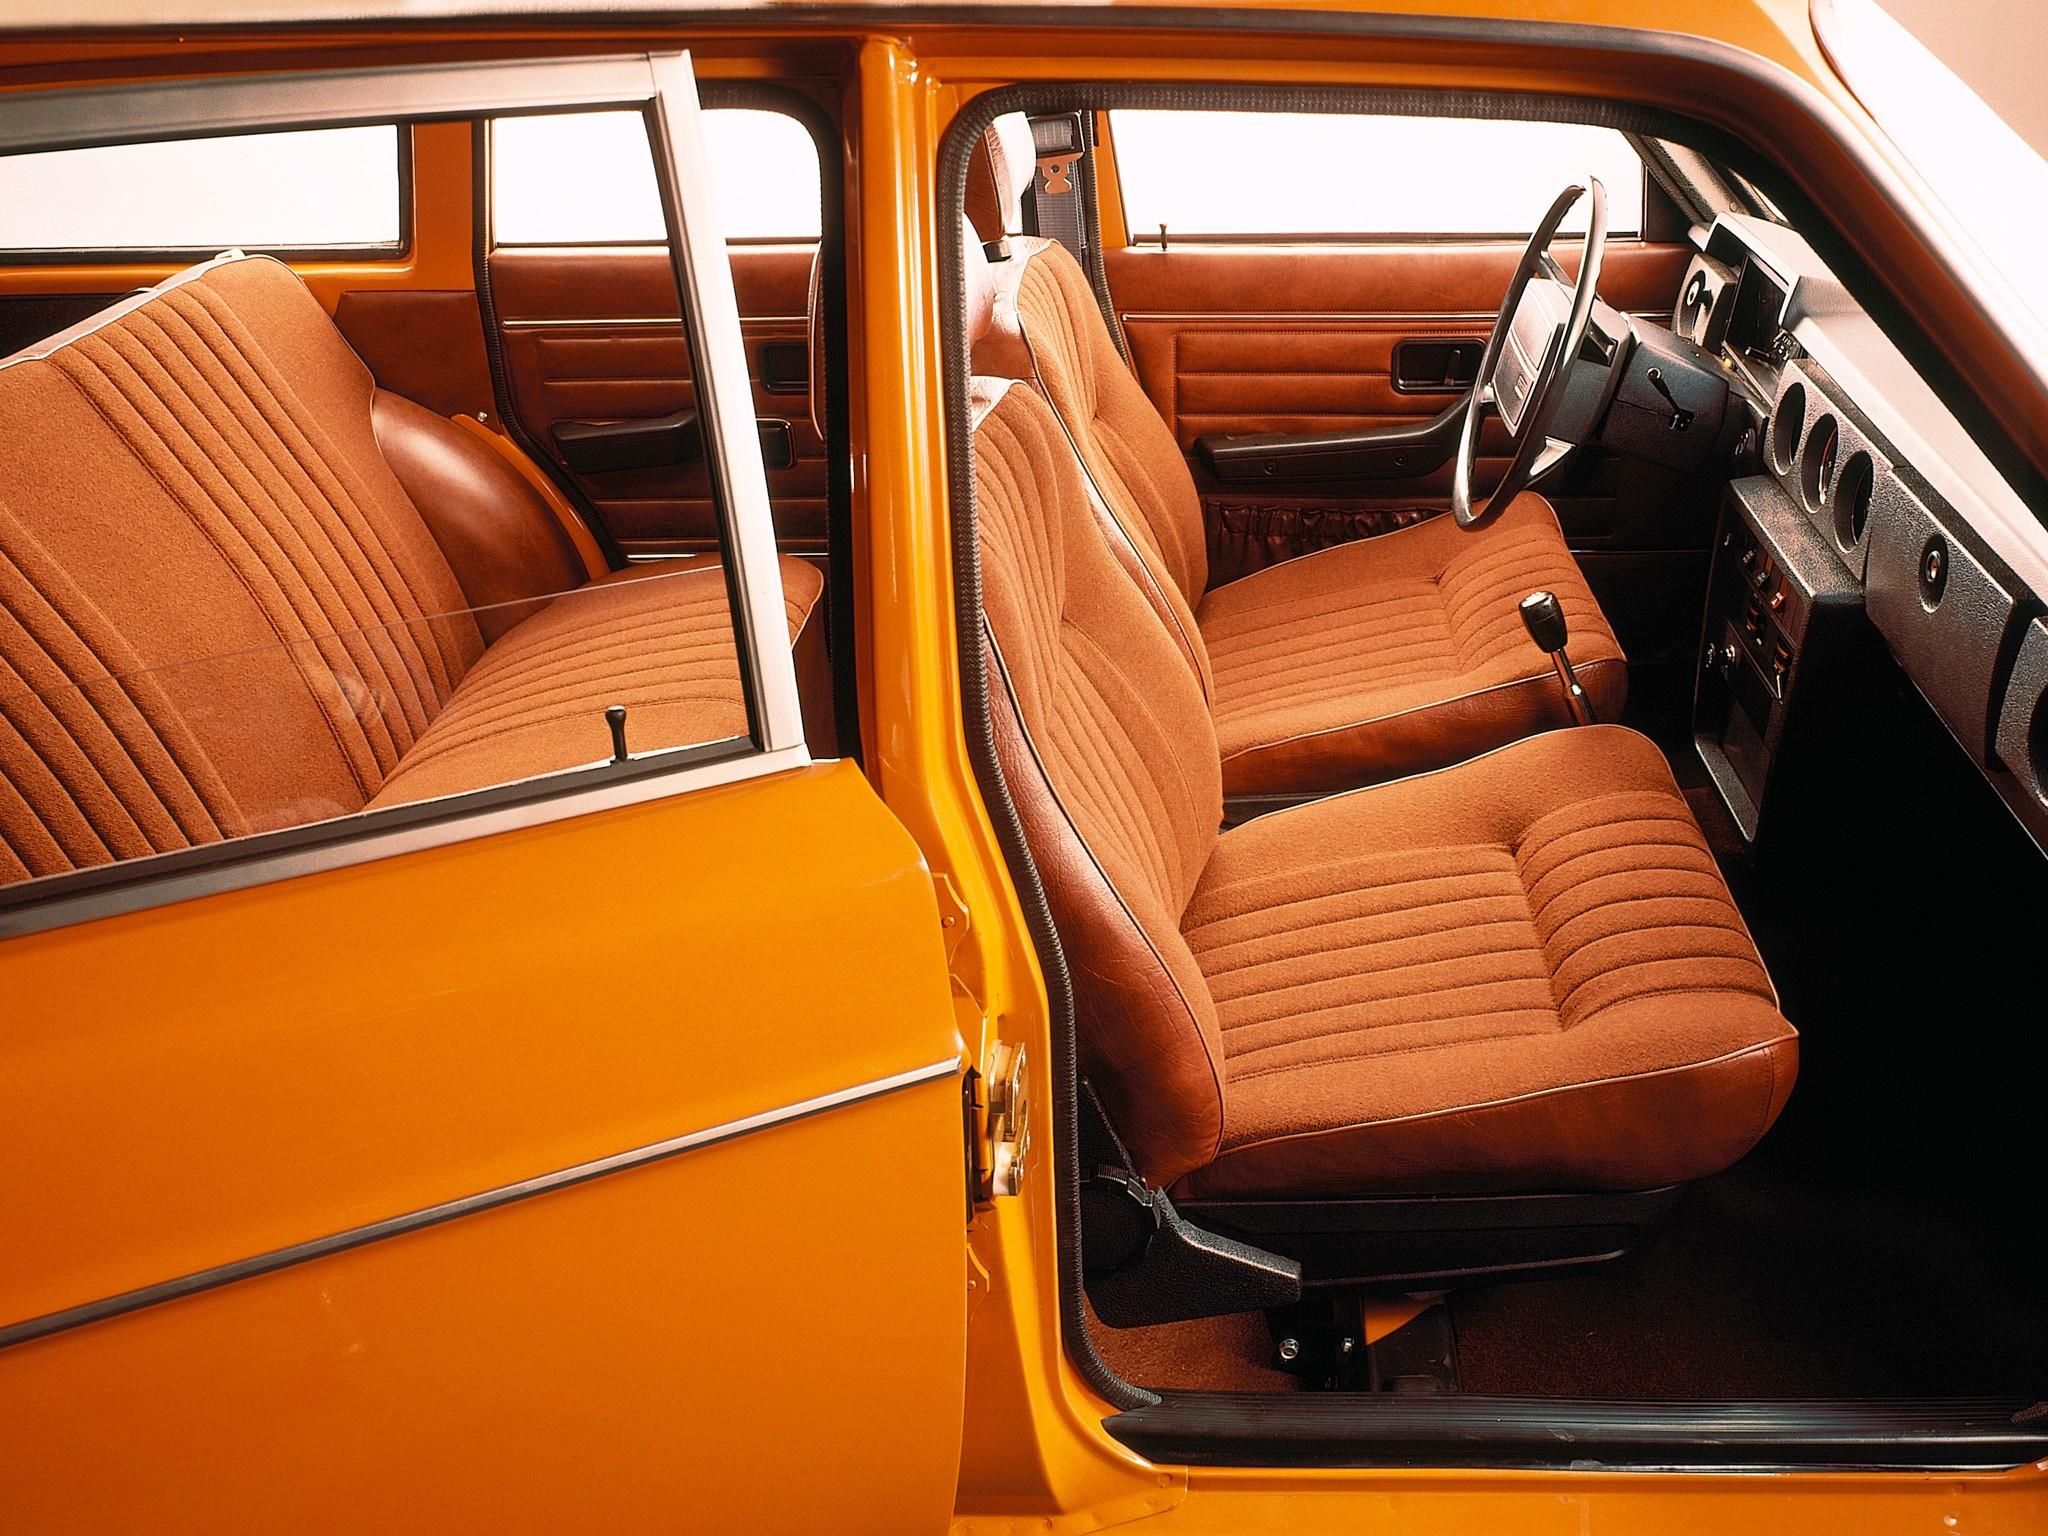 International Auto Show >> VOLVO 145 - 1967, 1968, 1969, 1970, 1971, 1972, 1973, 1974 - autoevolution